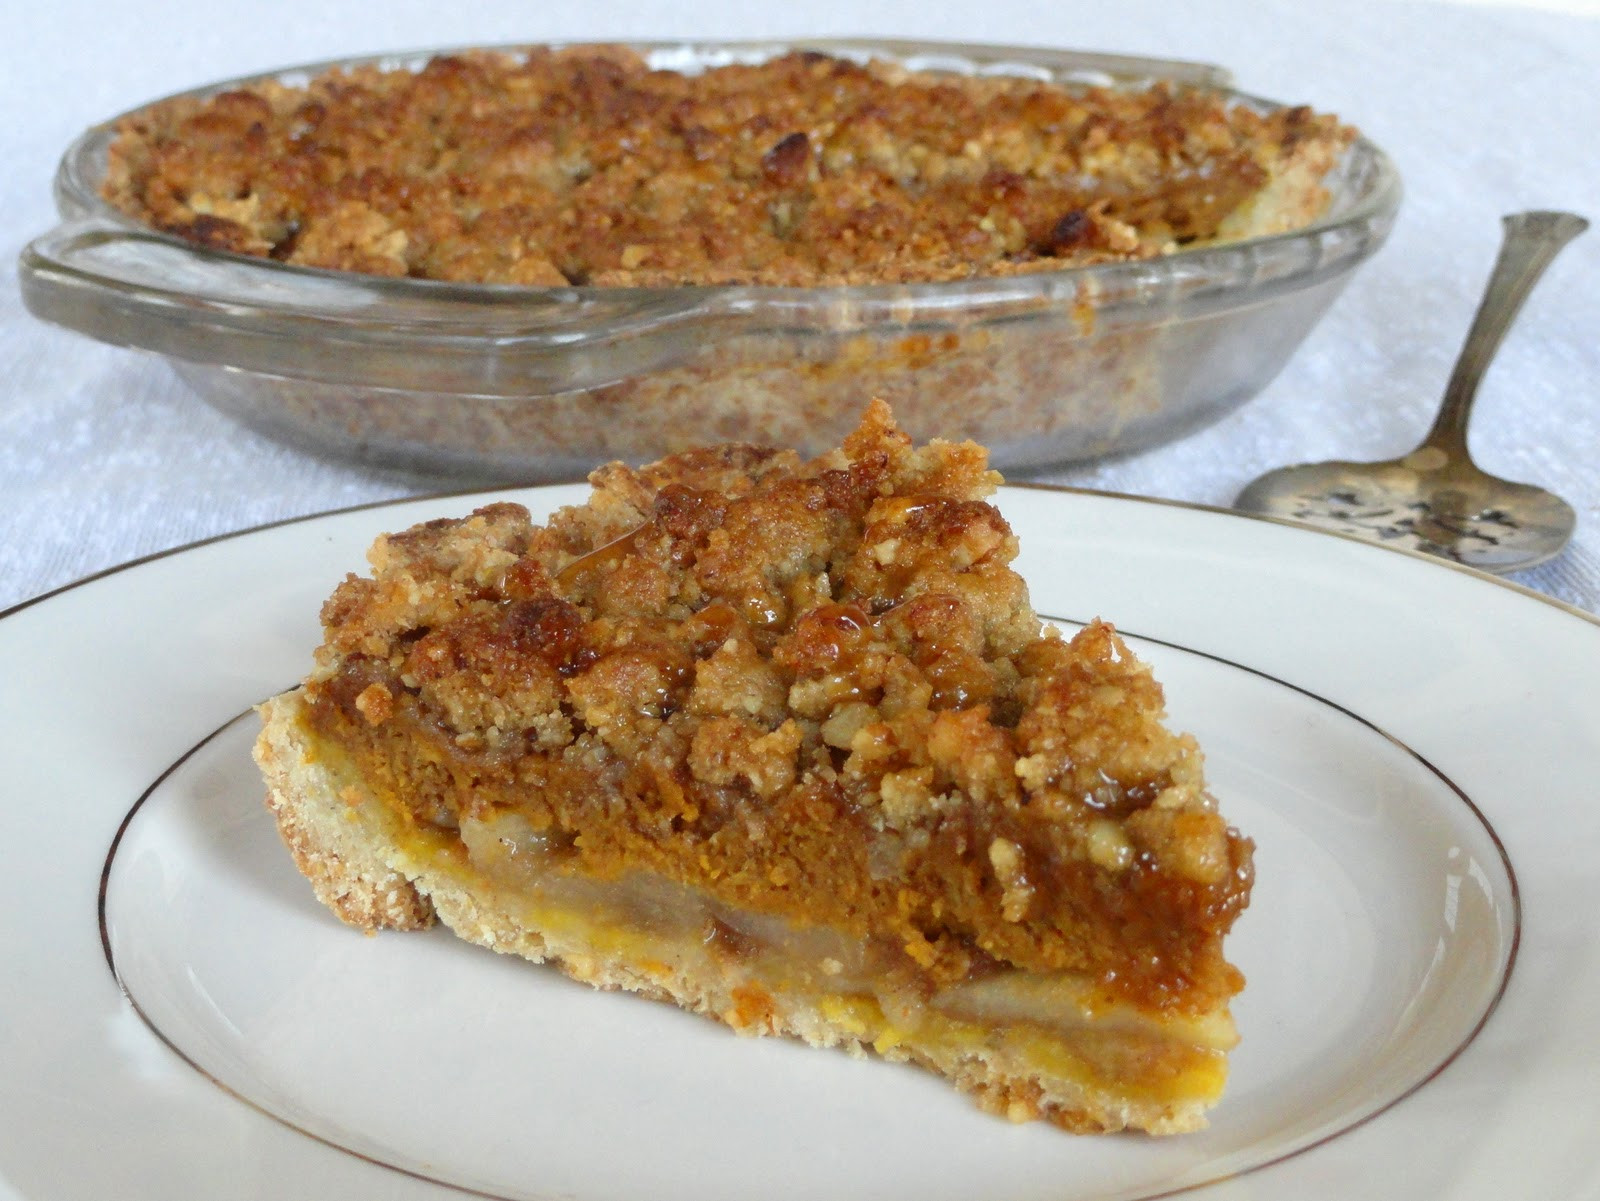 Gluten Free Desserts For Thanksgiving  As Good As Gluten Gluten Free Thanksgiving Desserts